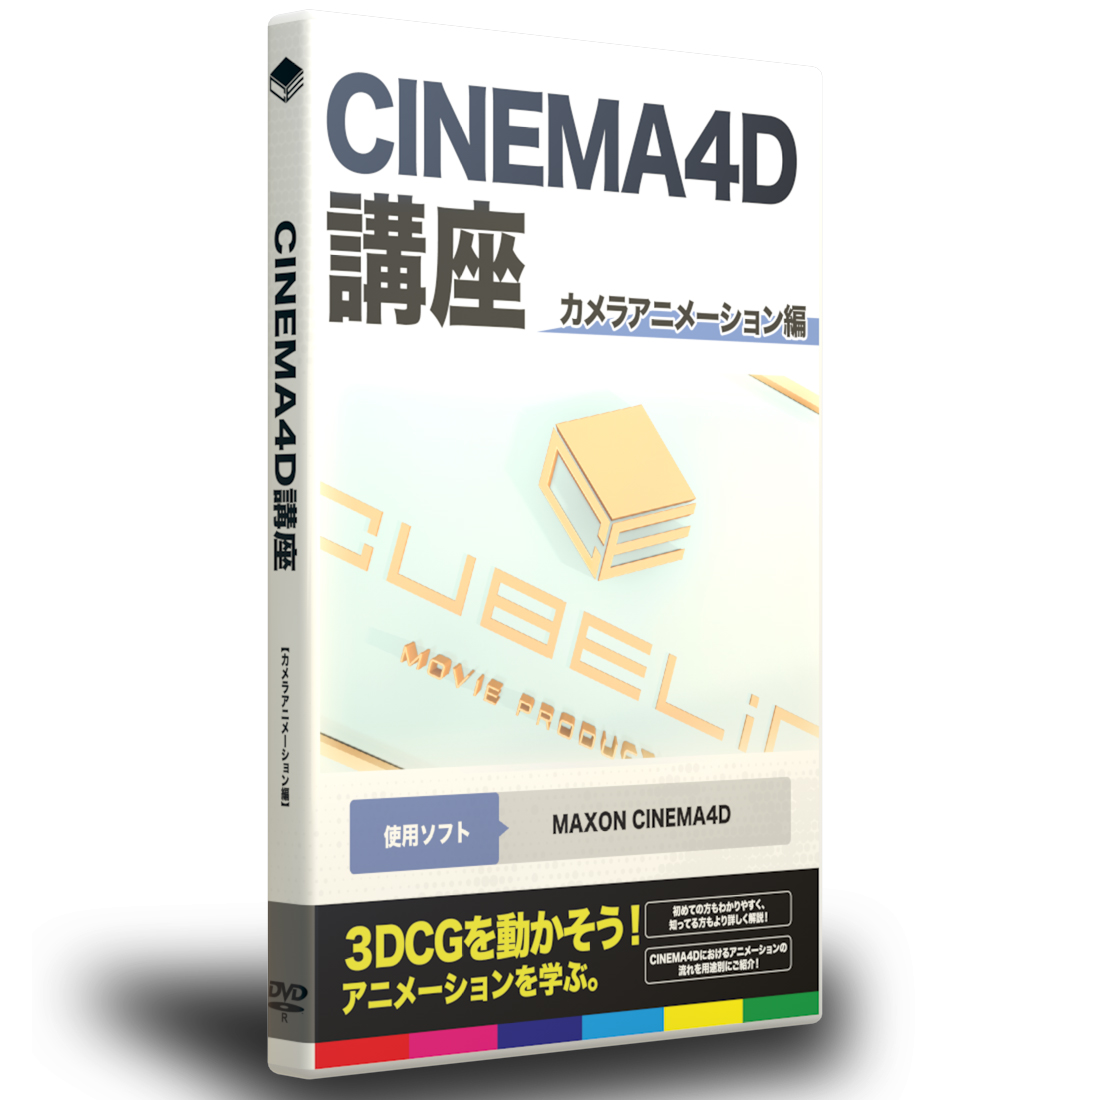 CINEMA4D講座【カメラアニメーション編】